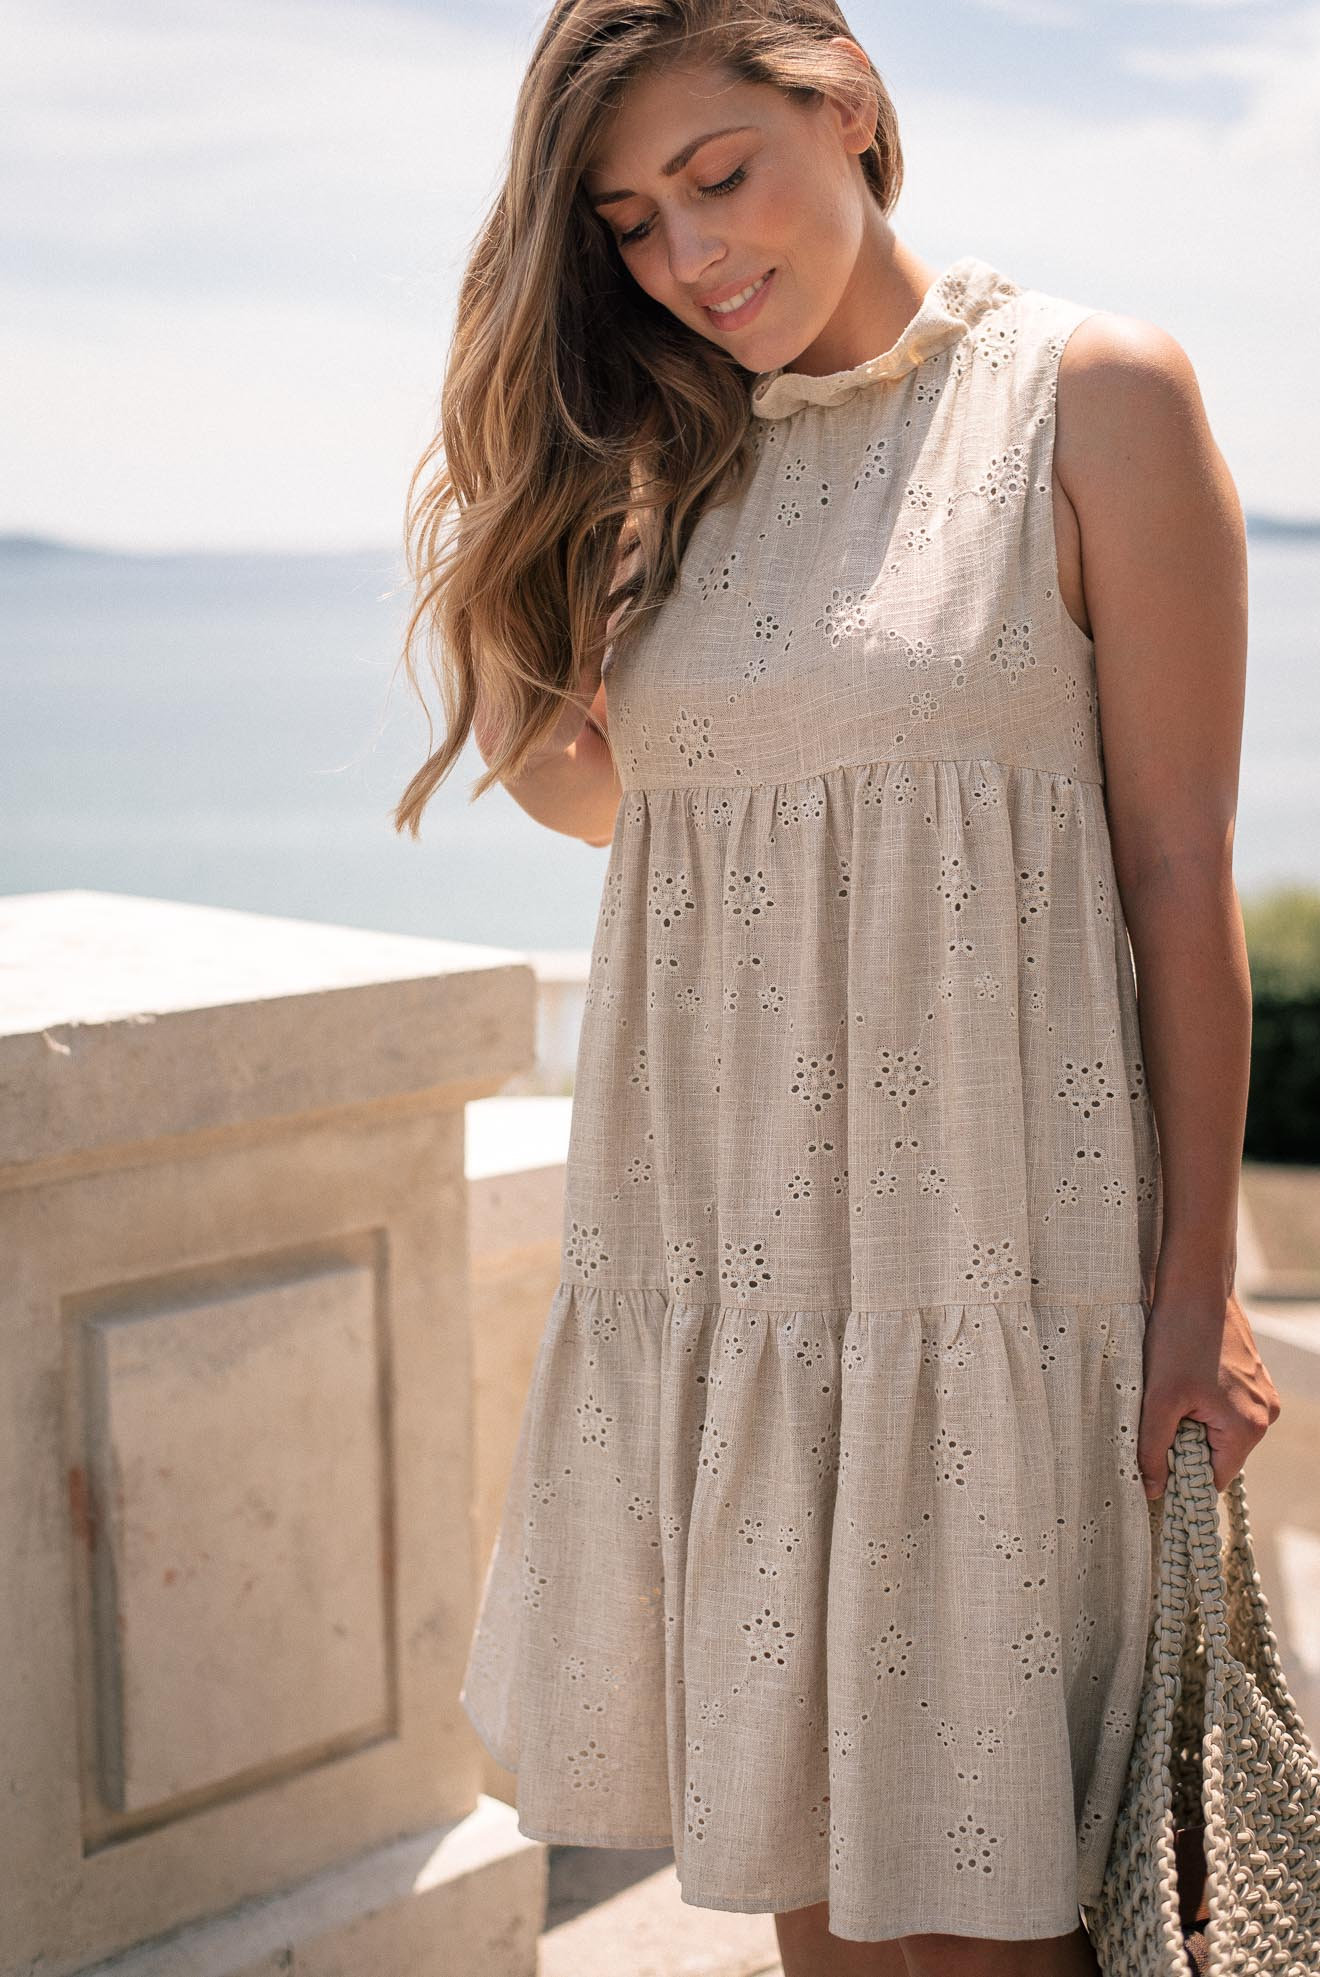 wearing Denina Martin dress